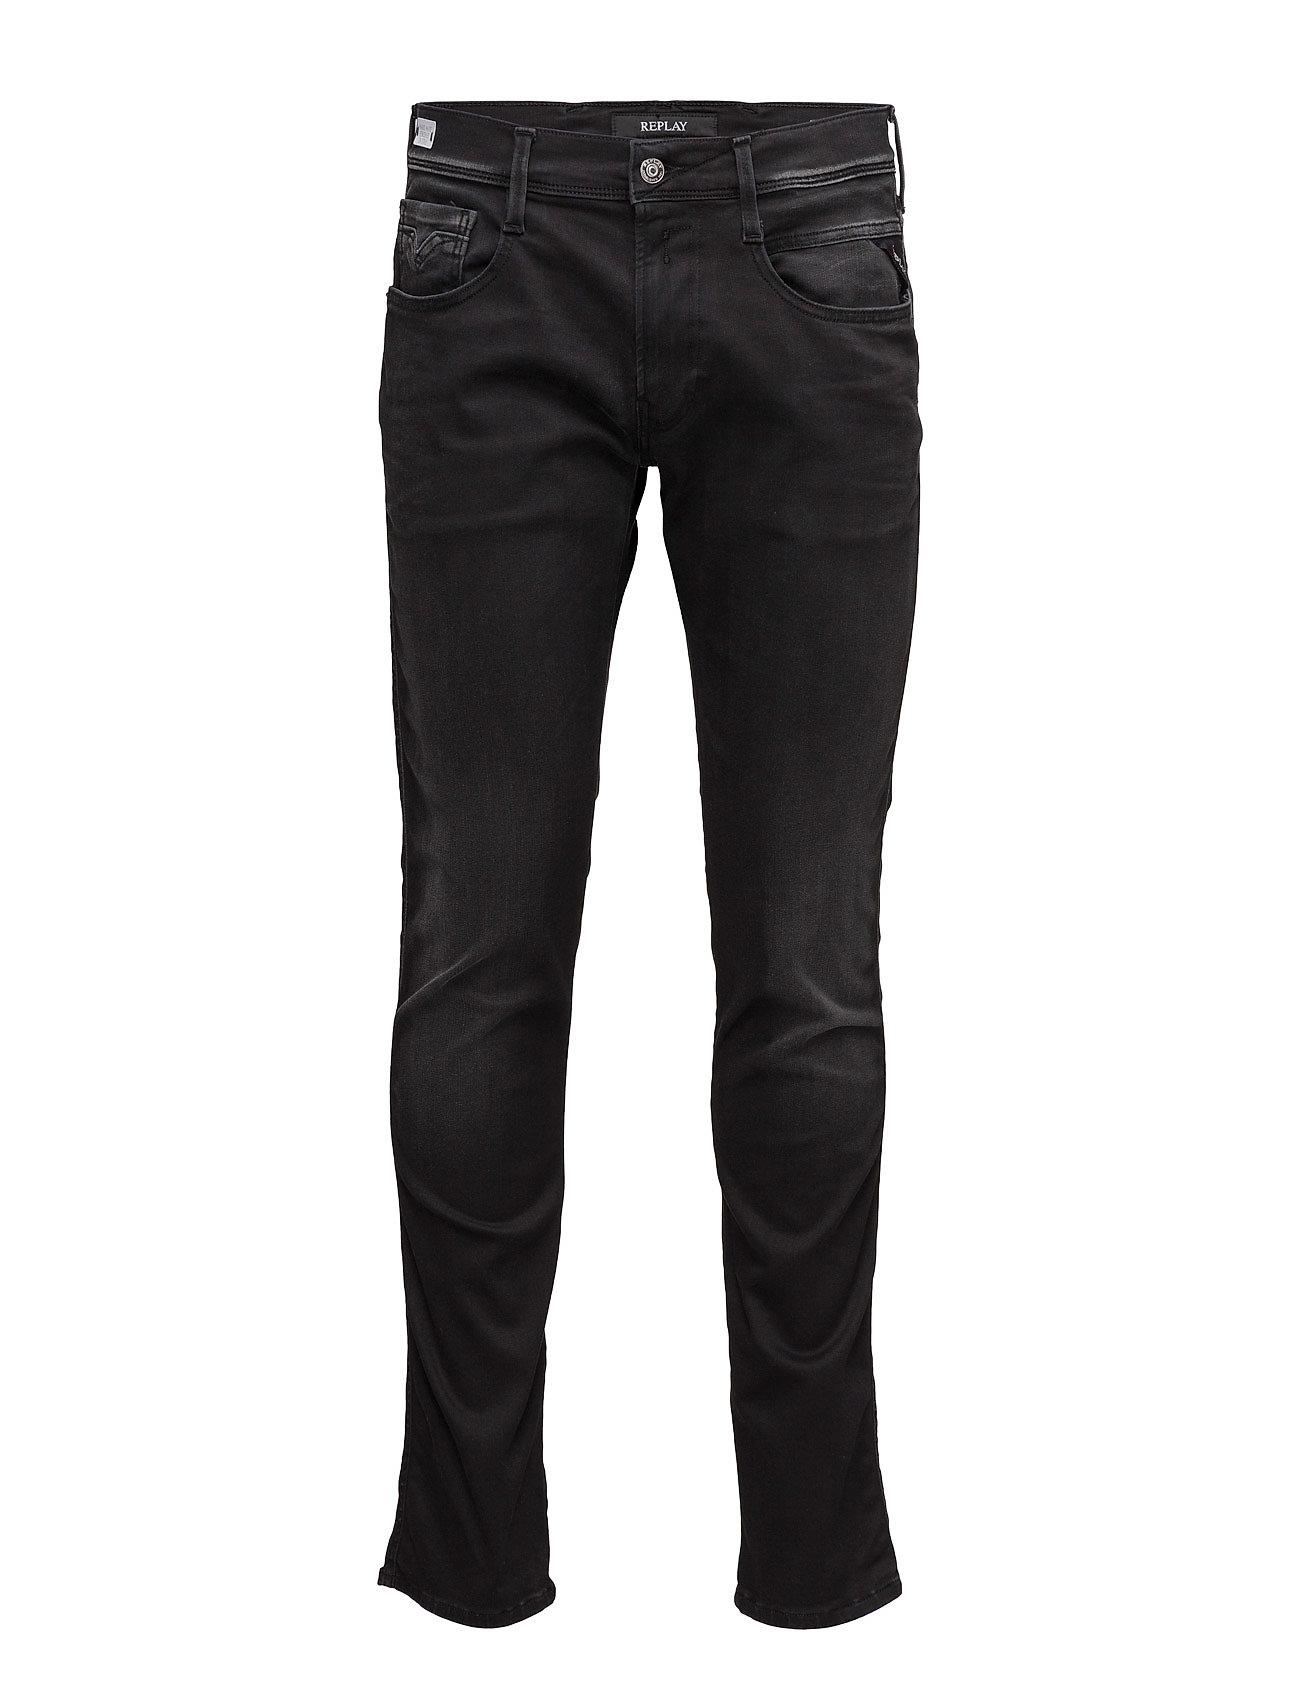 Anbass Pants Replay Jeans til Mænd i Denim